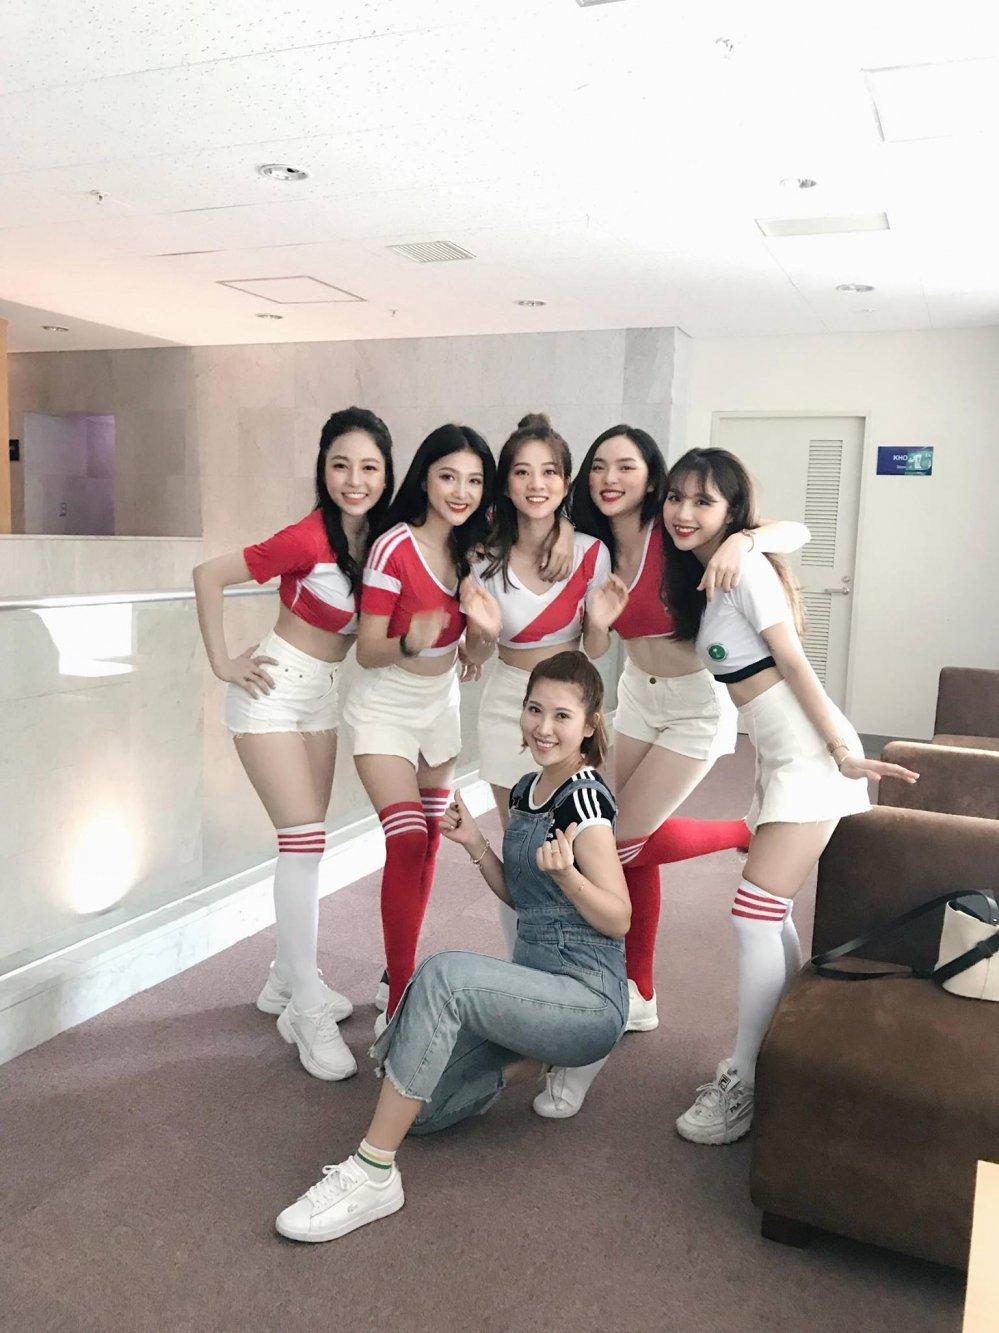 Ngam dan my nu 'Nong cung World Cup' tren VTV dep nghieng nuoc nghieng thanh hinh anh 13